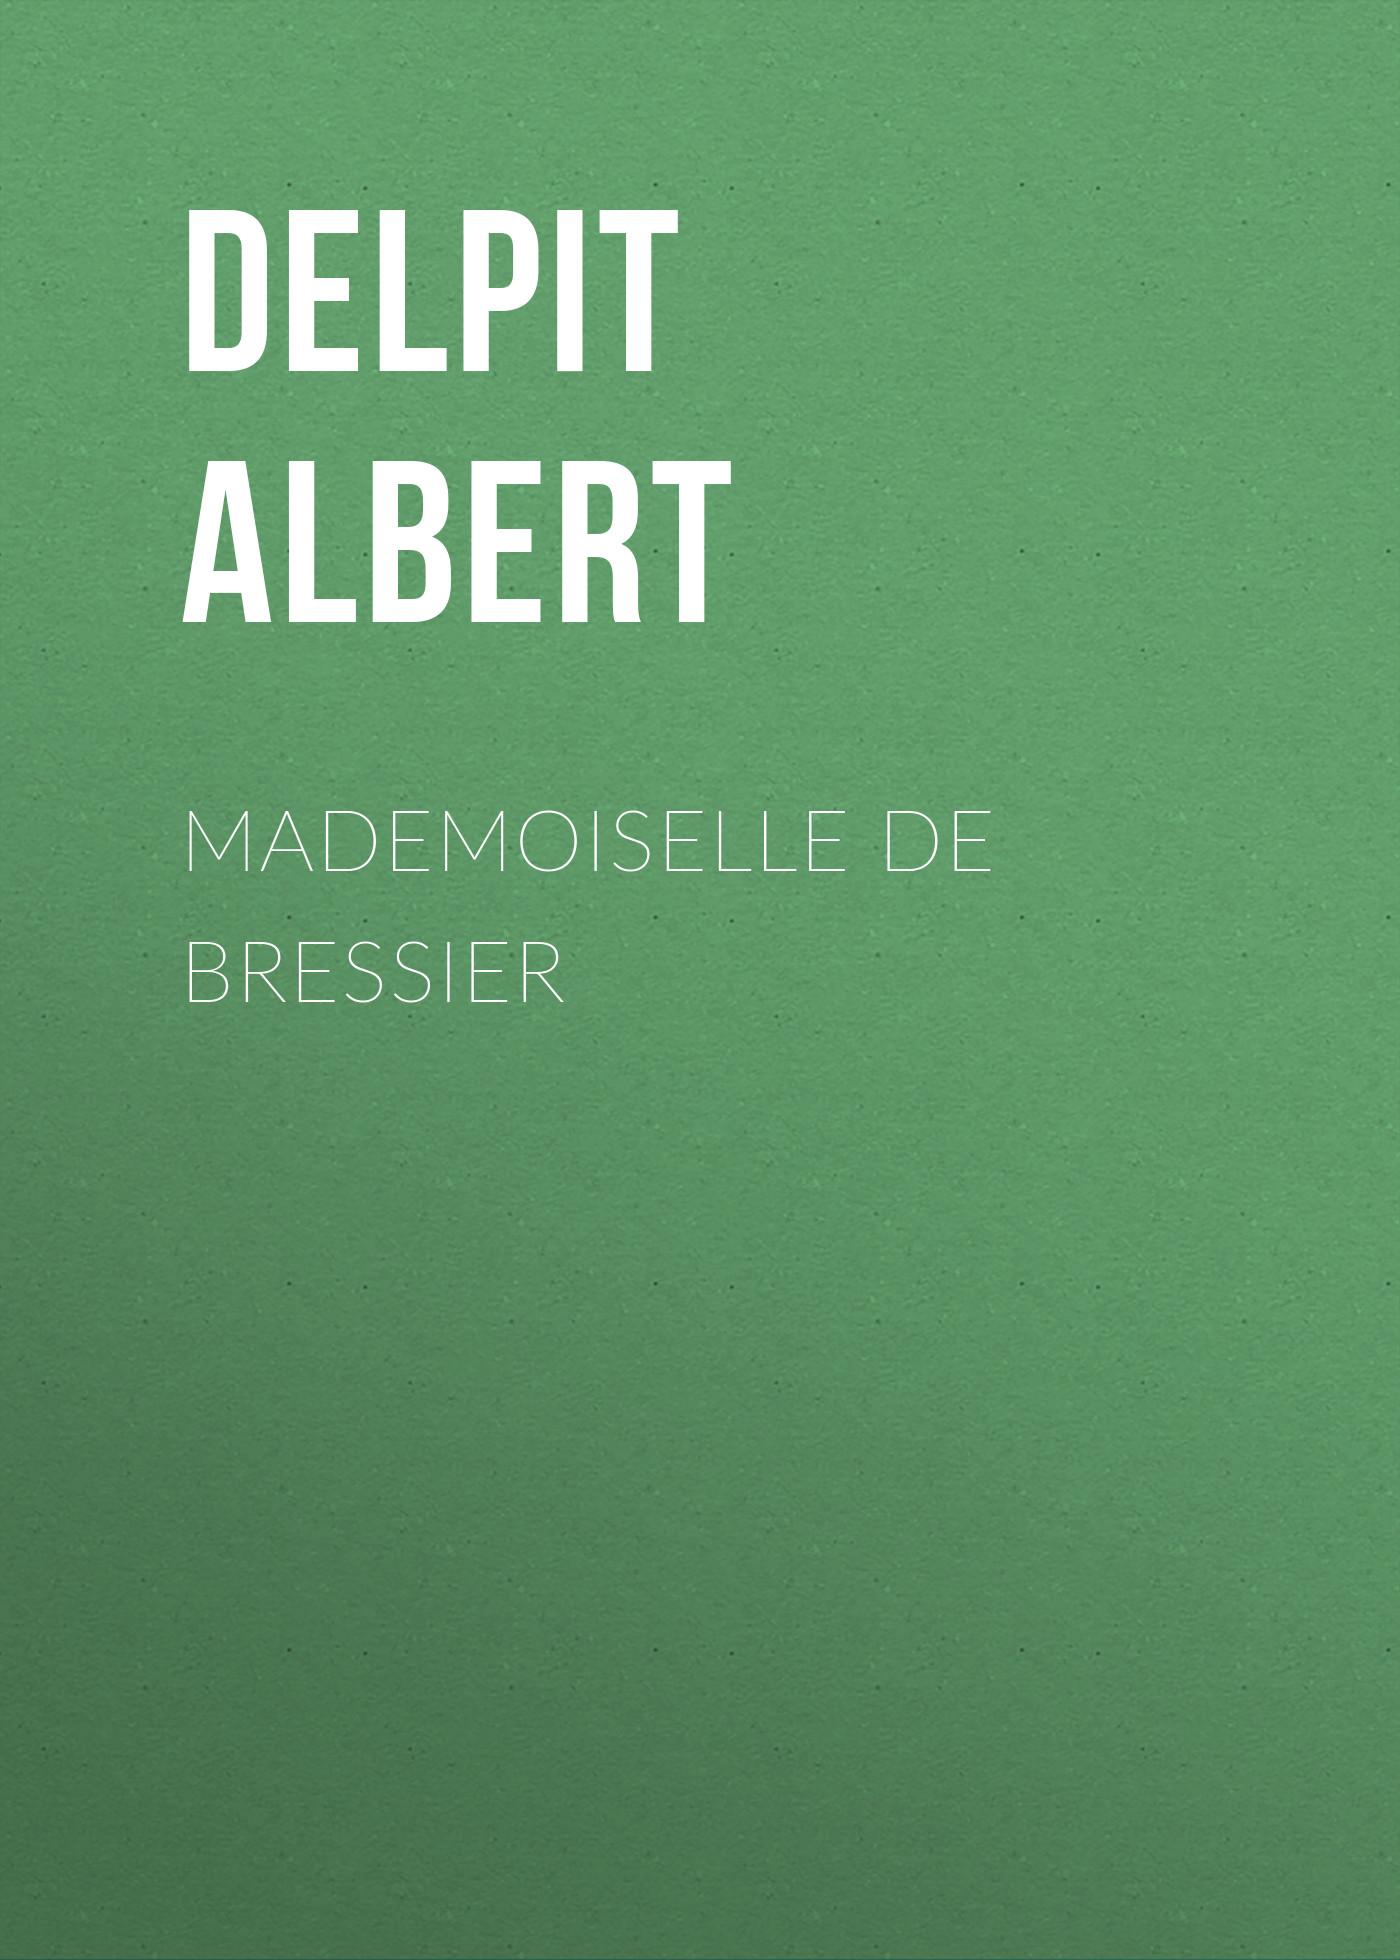 Delpit Albert Mademoiselle de Bressier chastity locks plastic vagina expansion device adult genitals anal vaginal dilator colposcopy speculum virgin lock